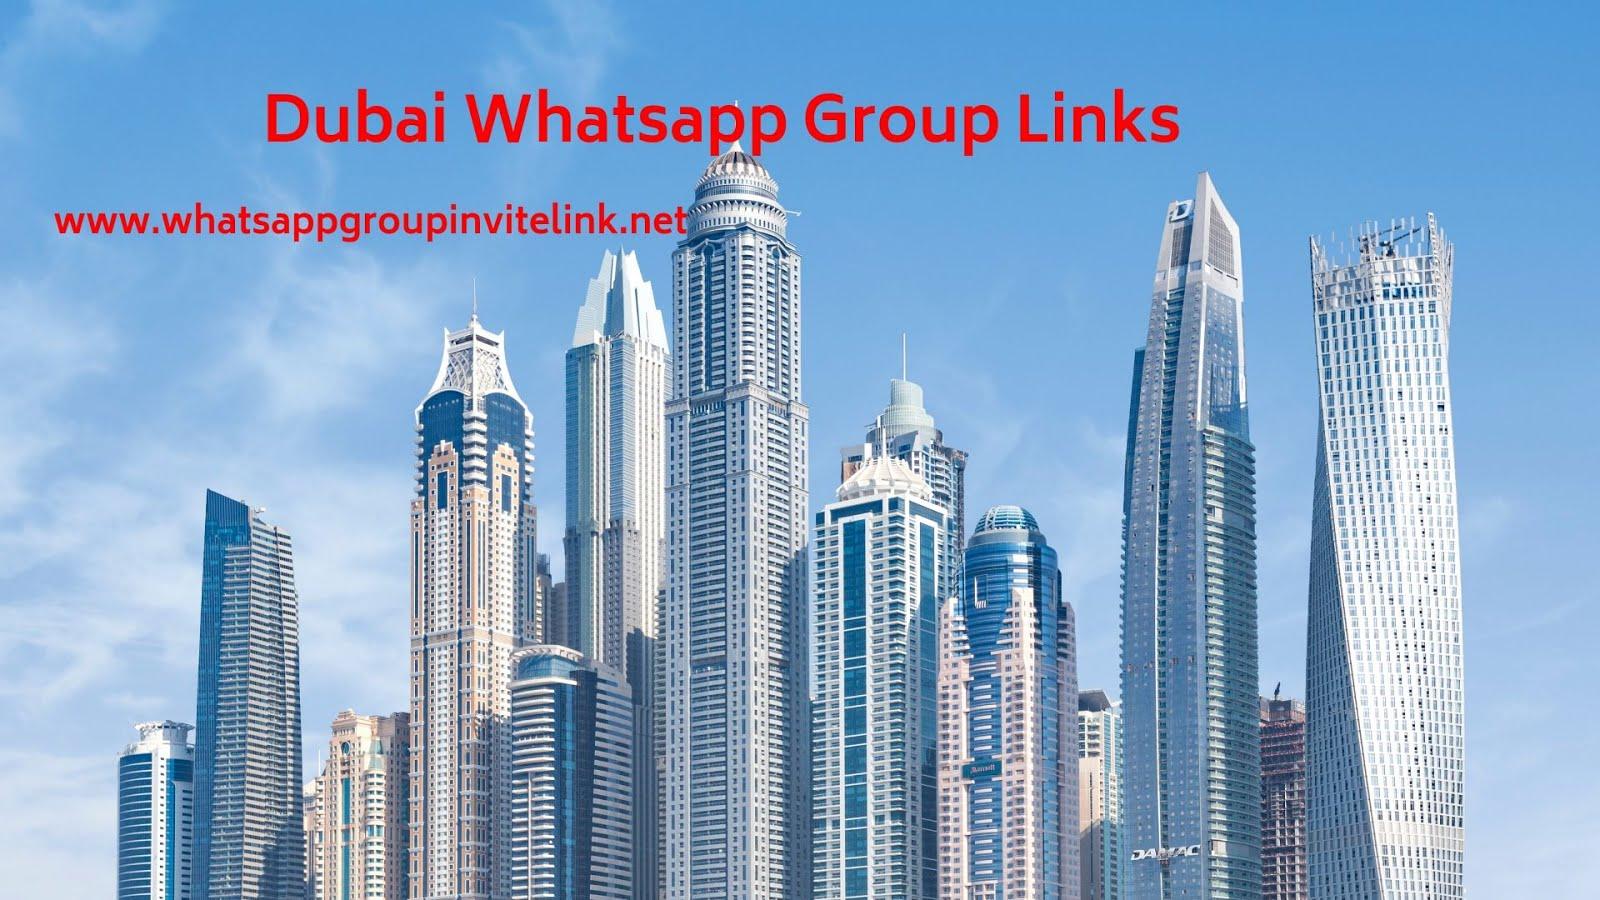 Whatsapp Group Invite Links: Dubai Whatsapp Group Links